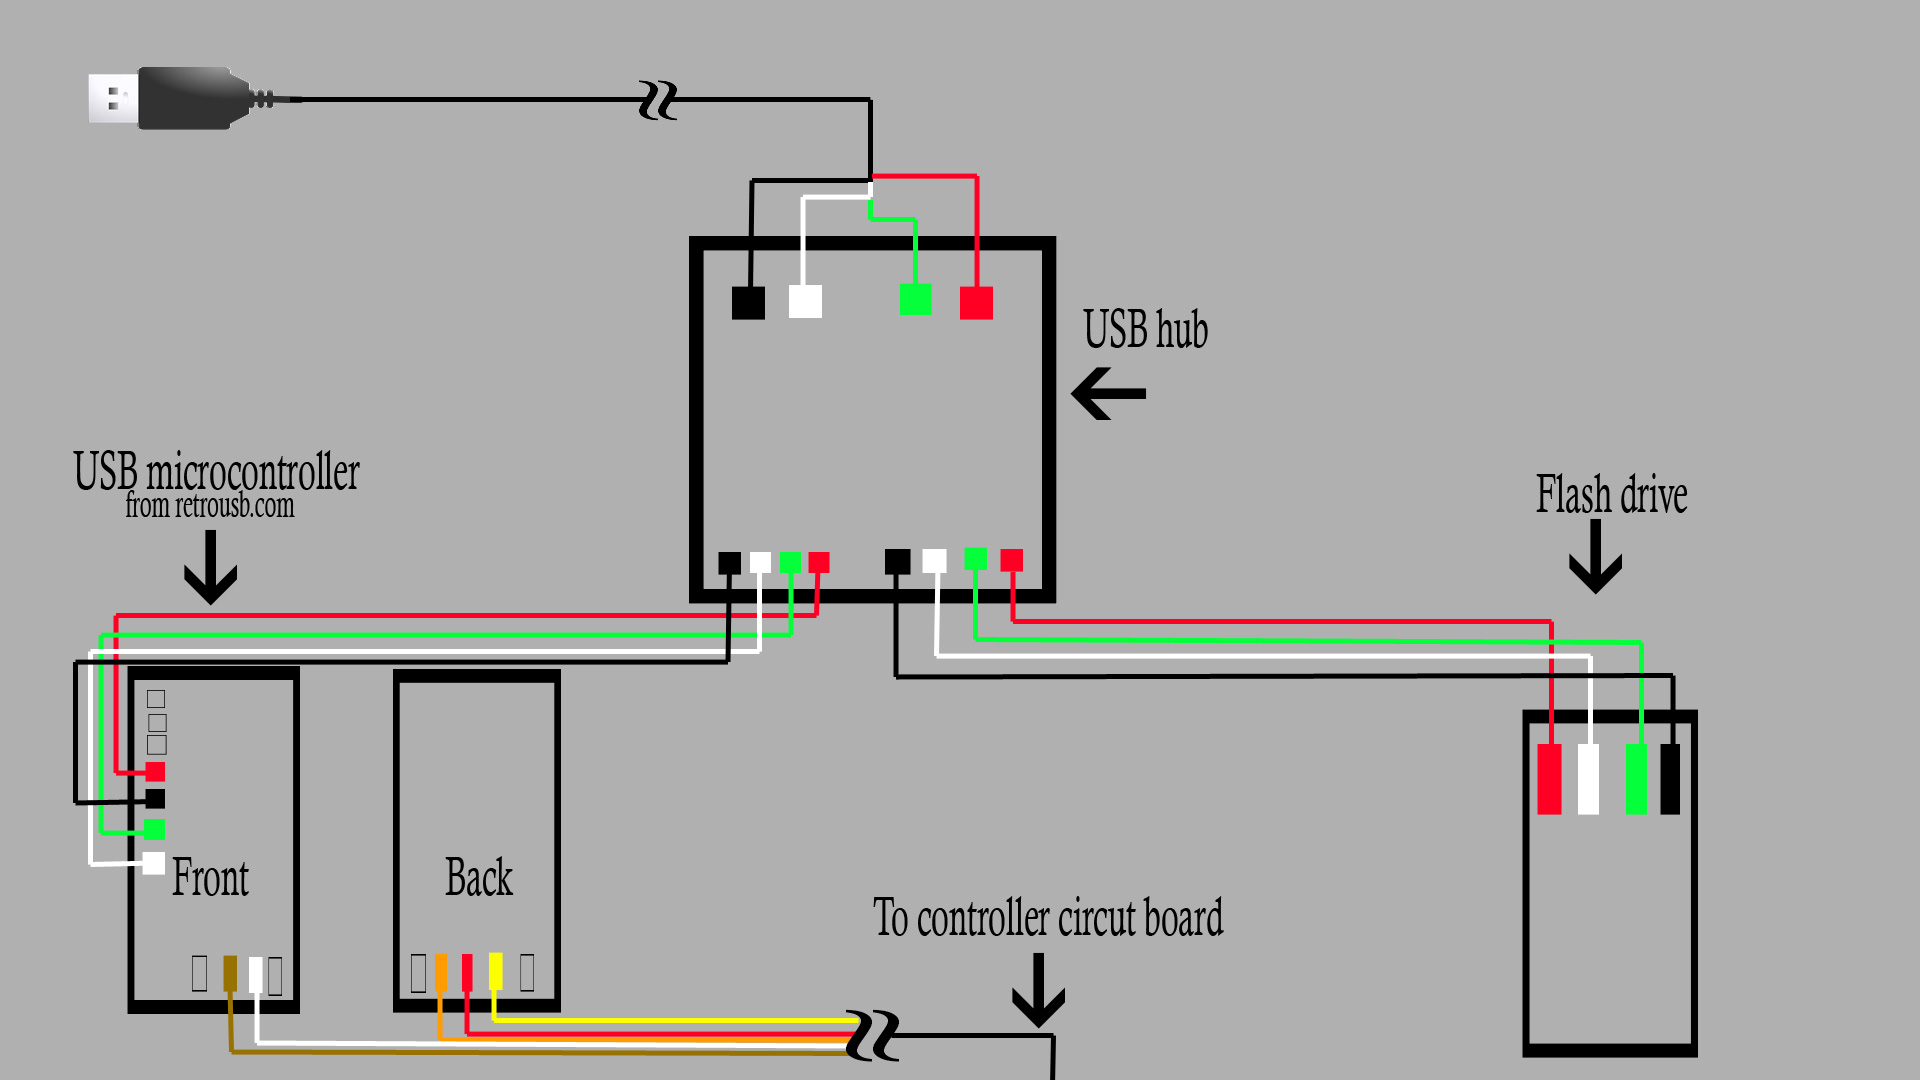 dualshock 2 wiring diagram 33 ps2 controller to usb wiring diagram wiring diagram list  33 ps2 controller to usb wiring diagram